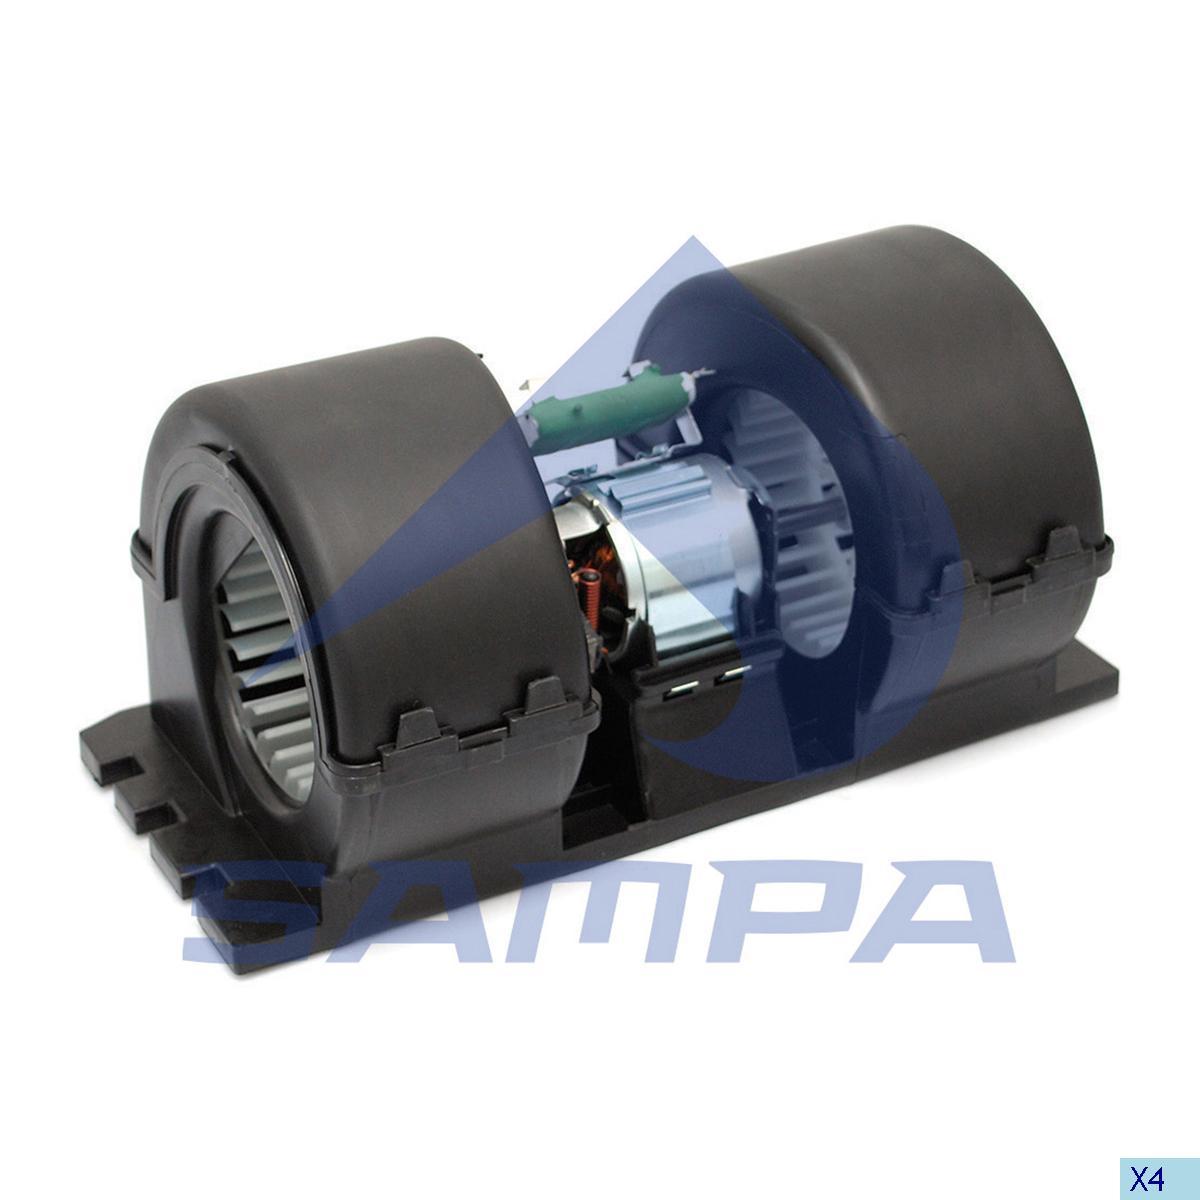 Fan Motor, Cab Heating & Ventilation, Mercedes, Cab